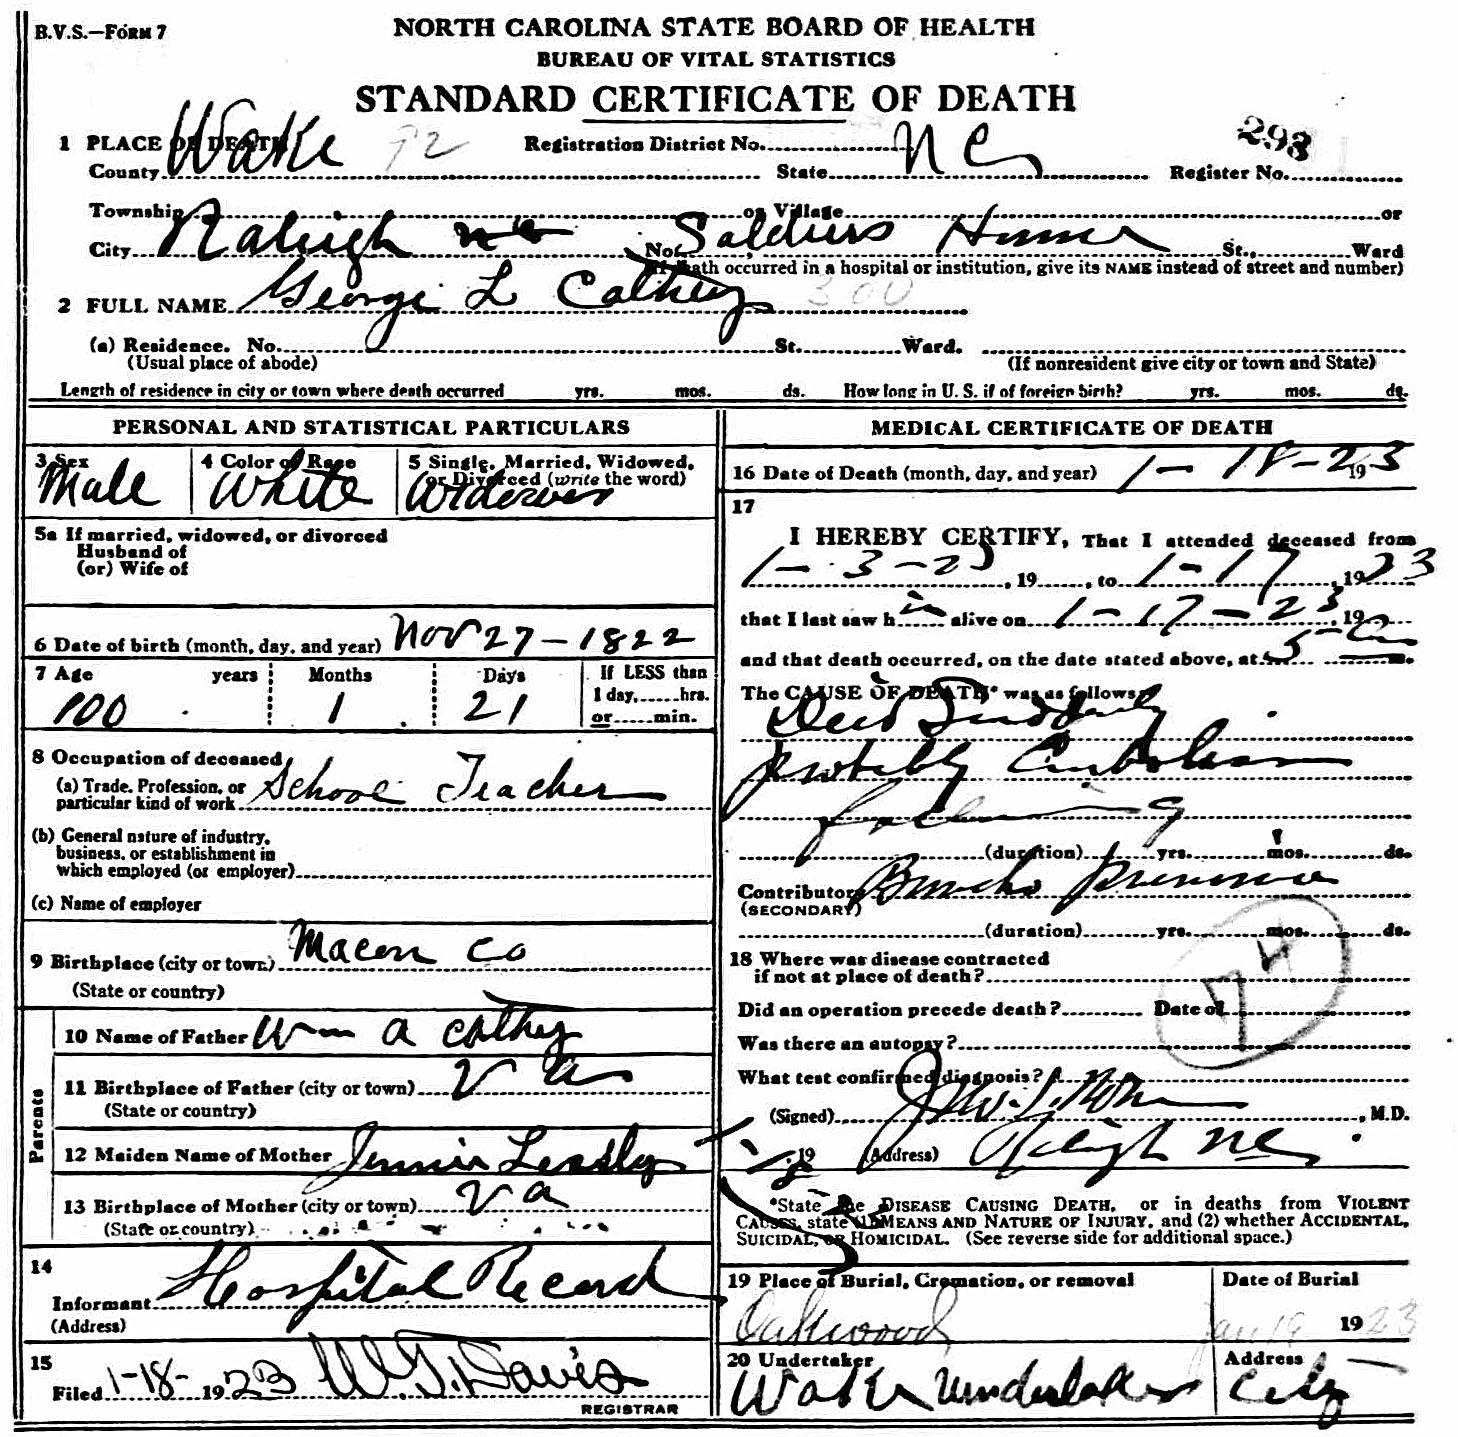 Captain George Leonidas Cathey Death Certificate